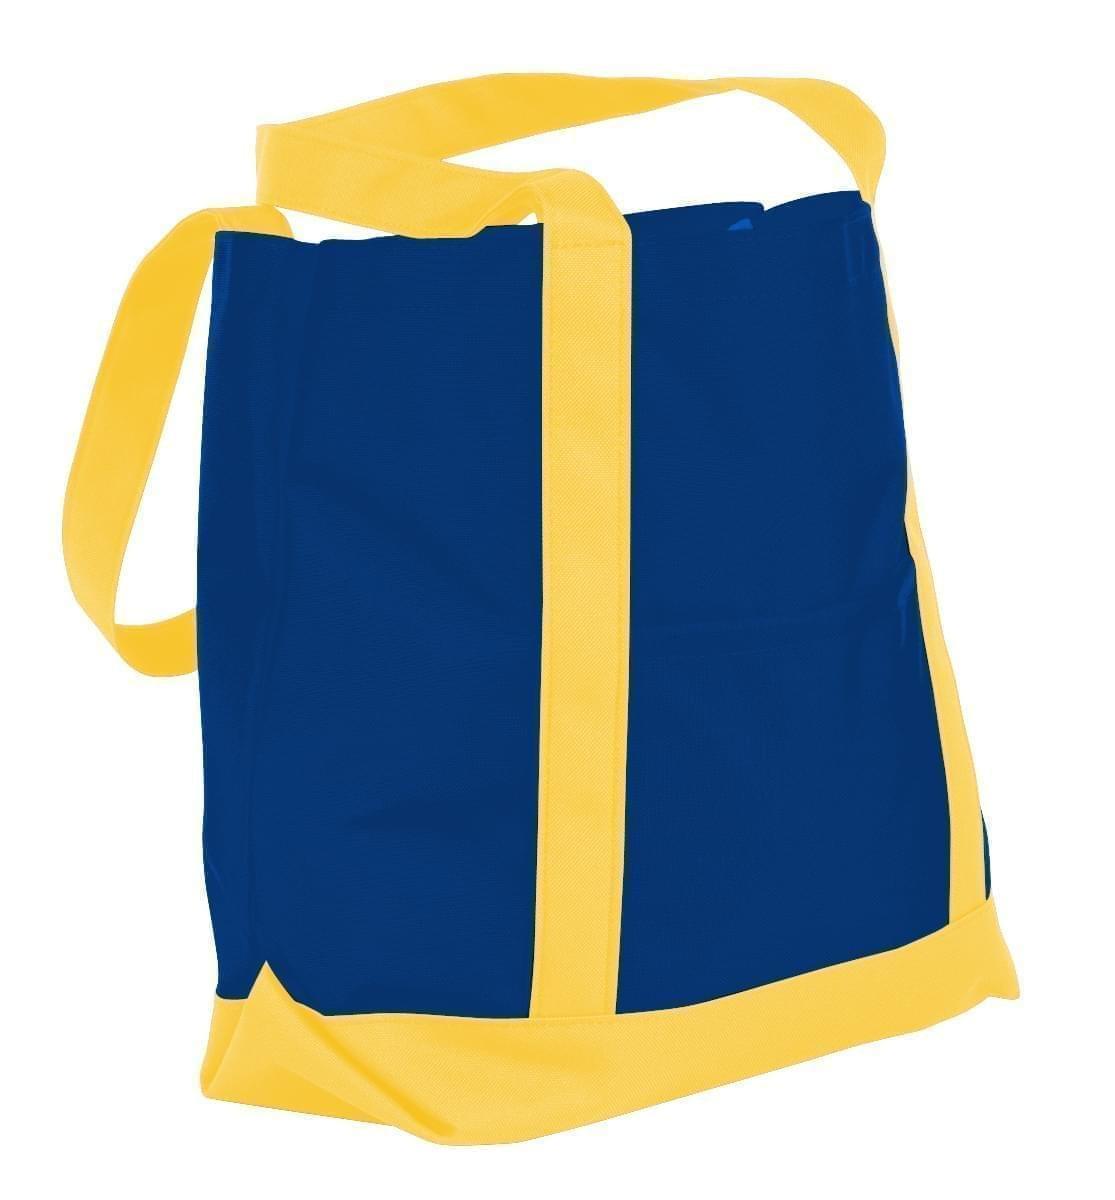 USA Made Canvas Fashion Tote Bags, Royal Blue-Gold, XAACL1UAFQ